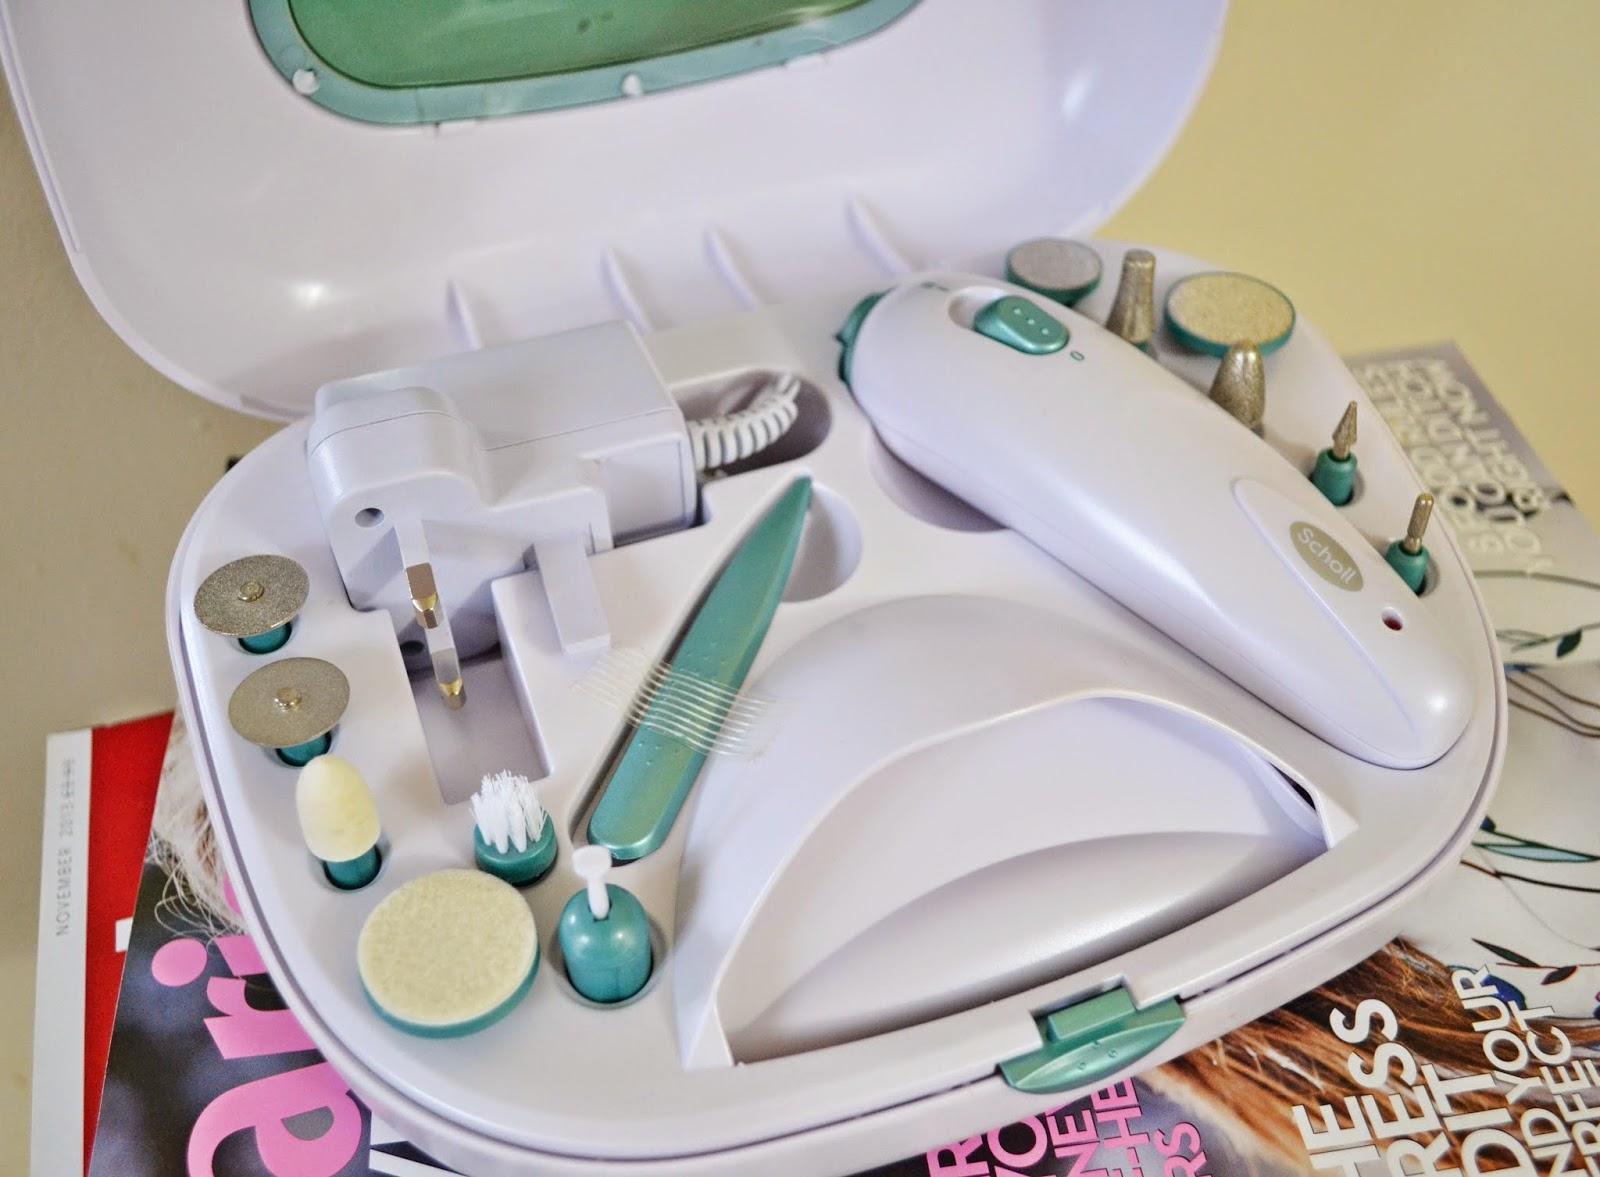 Scholl Manicure Pedicure Nail Beauty Set   Christmas Gift Guide #1 - Aspiring Londoner